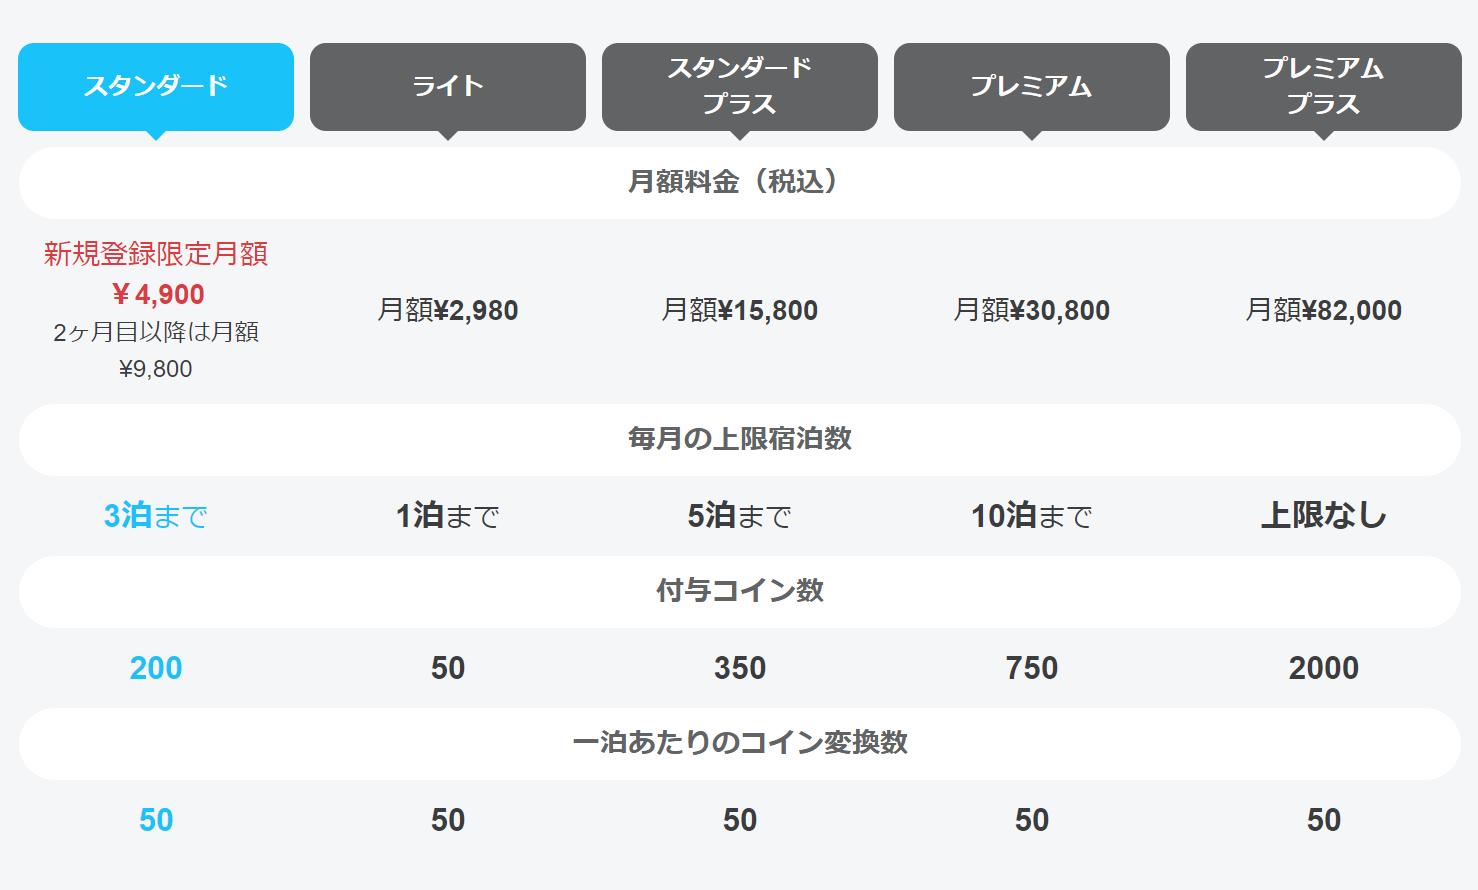 HafHのプラン比較表